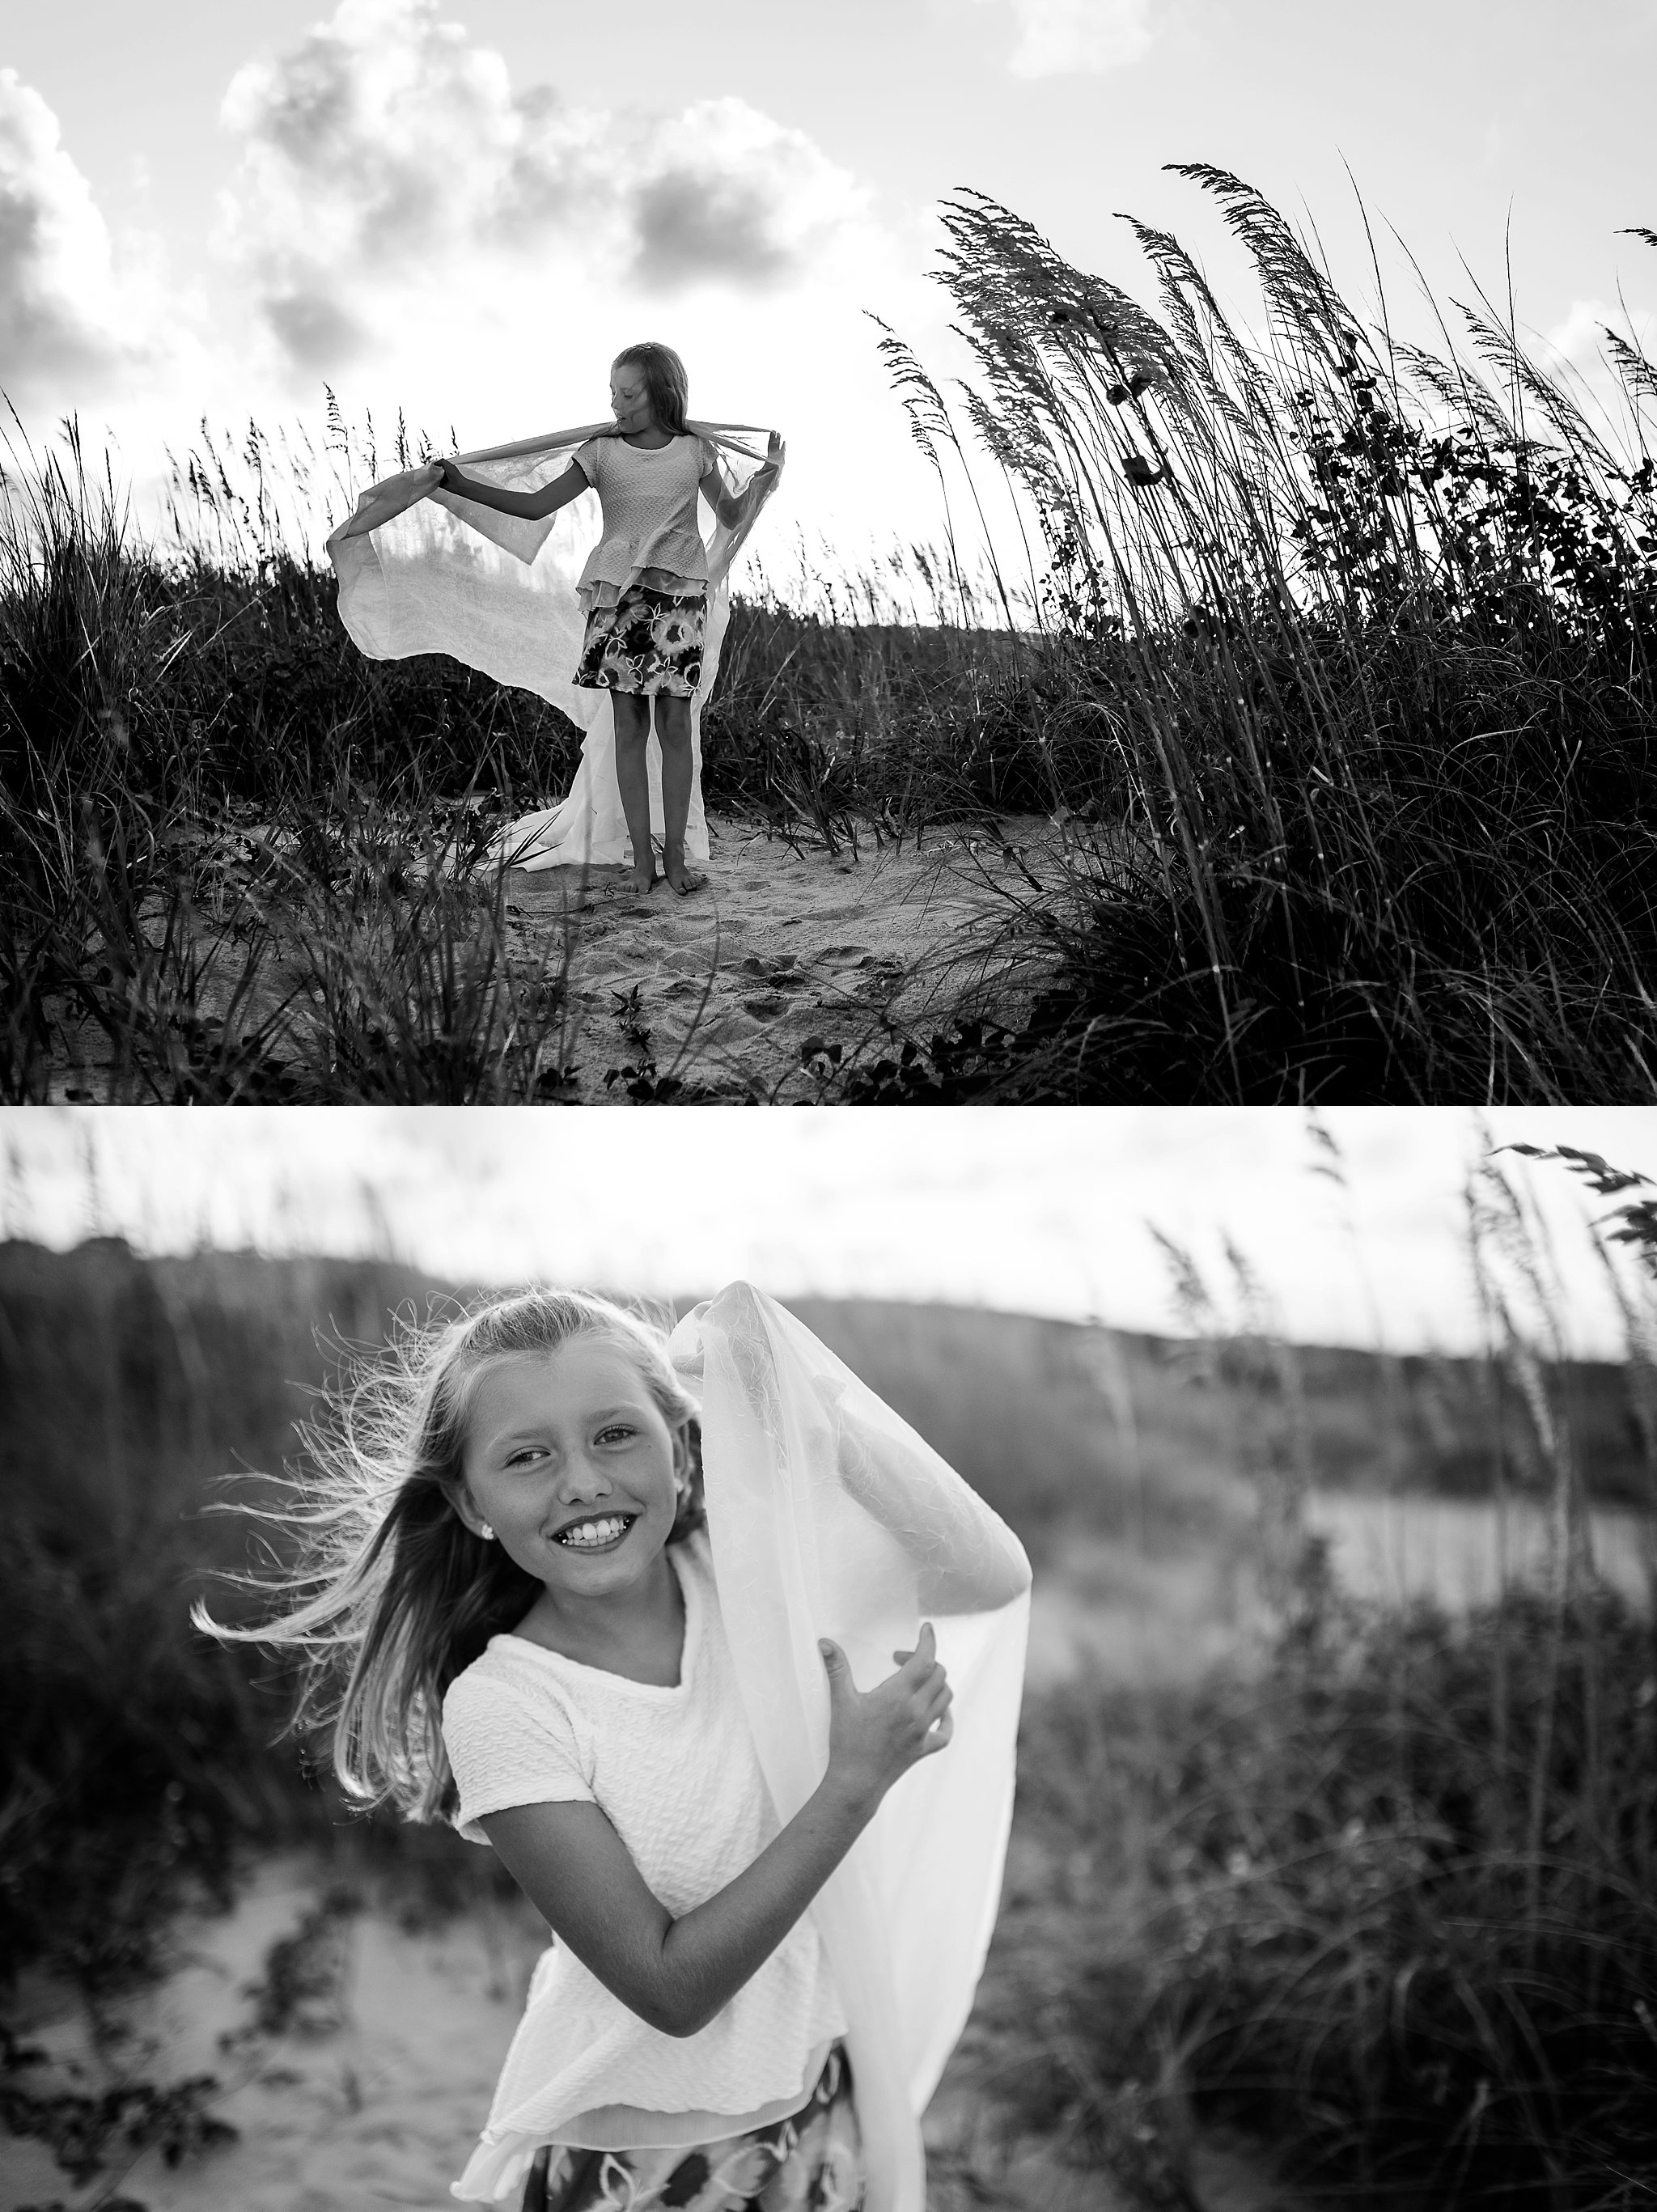 sandbridge-virginia-beach-family-and-child-photographer-melissa-bliss-photography-beach-sessions.png